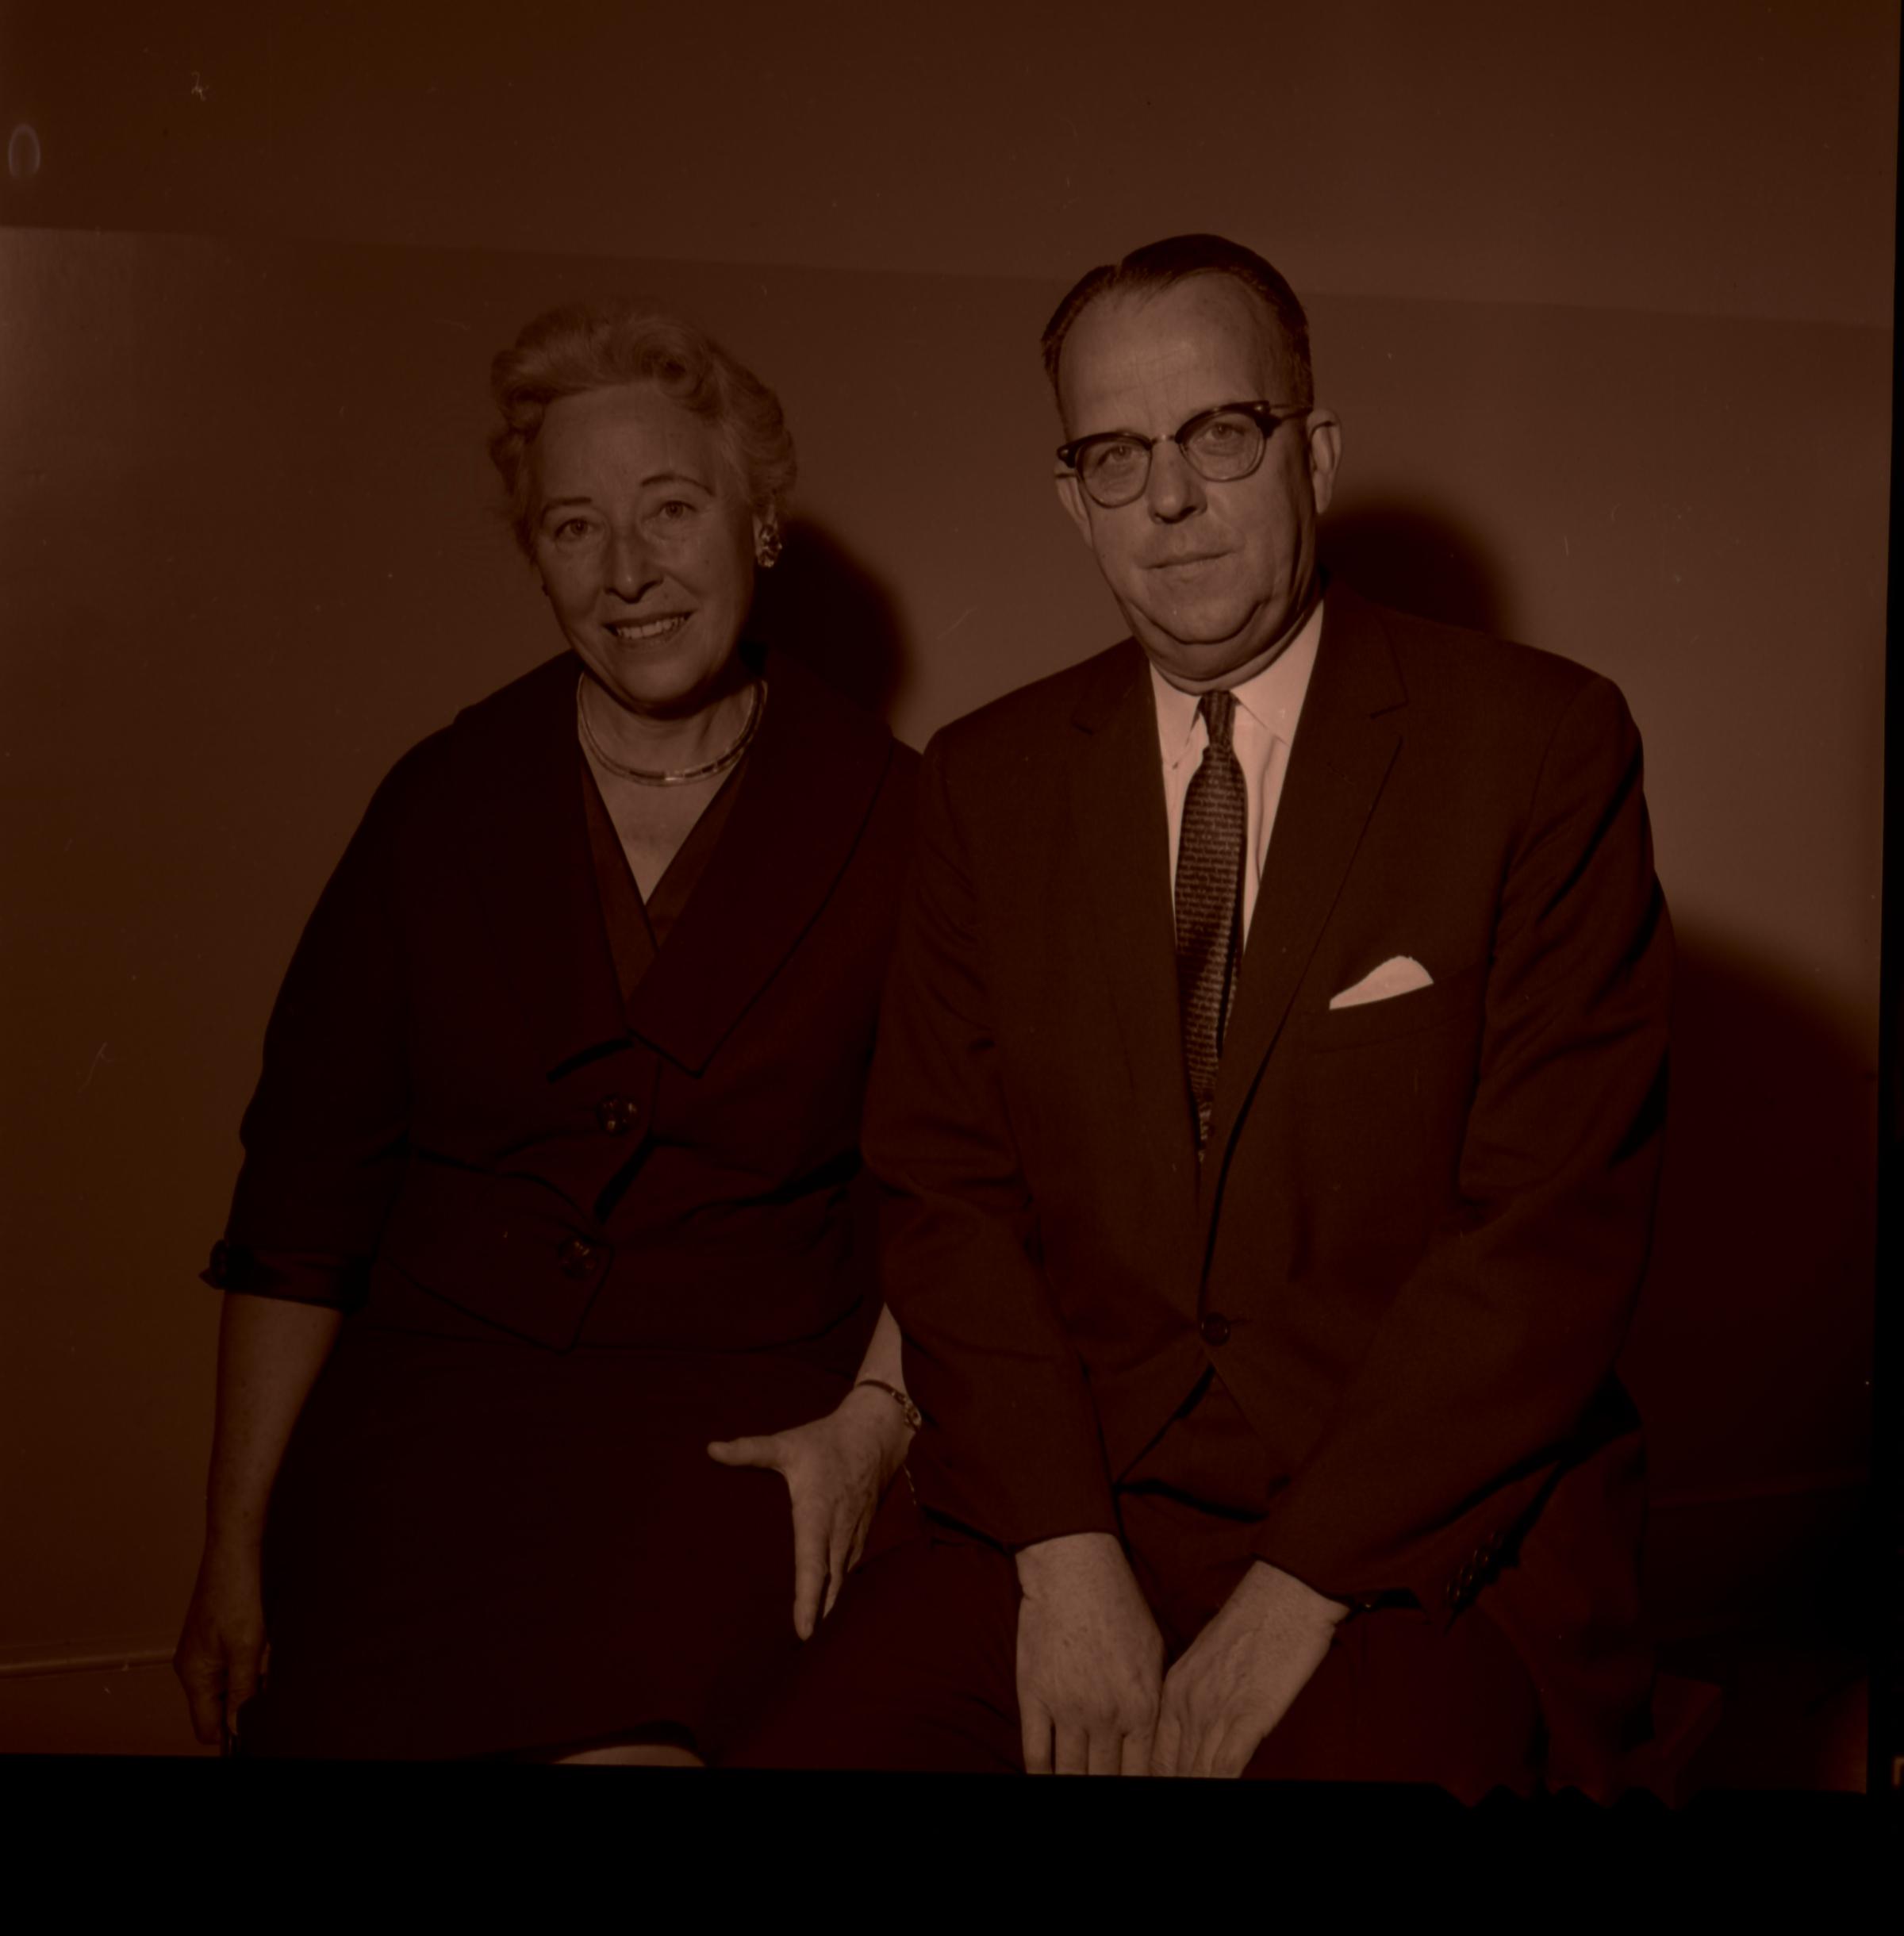 Sister Helen K. Richards and her husband, Elder Franklin D. Richards of the Presidency of the Seventy, circa 1960.